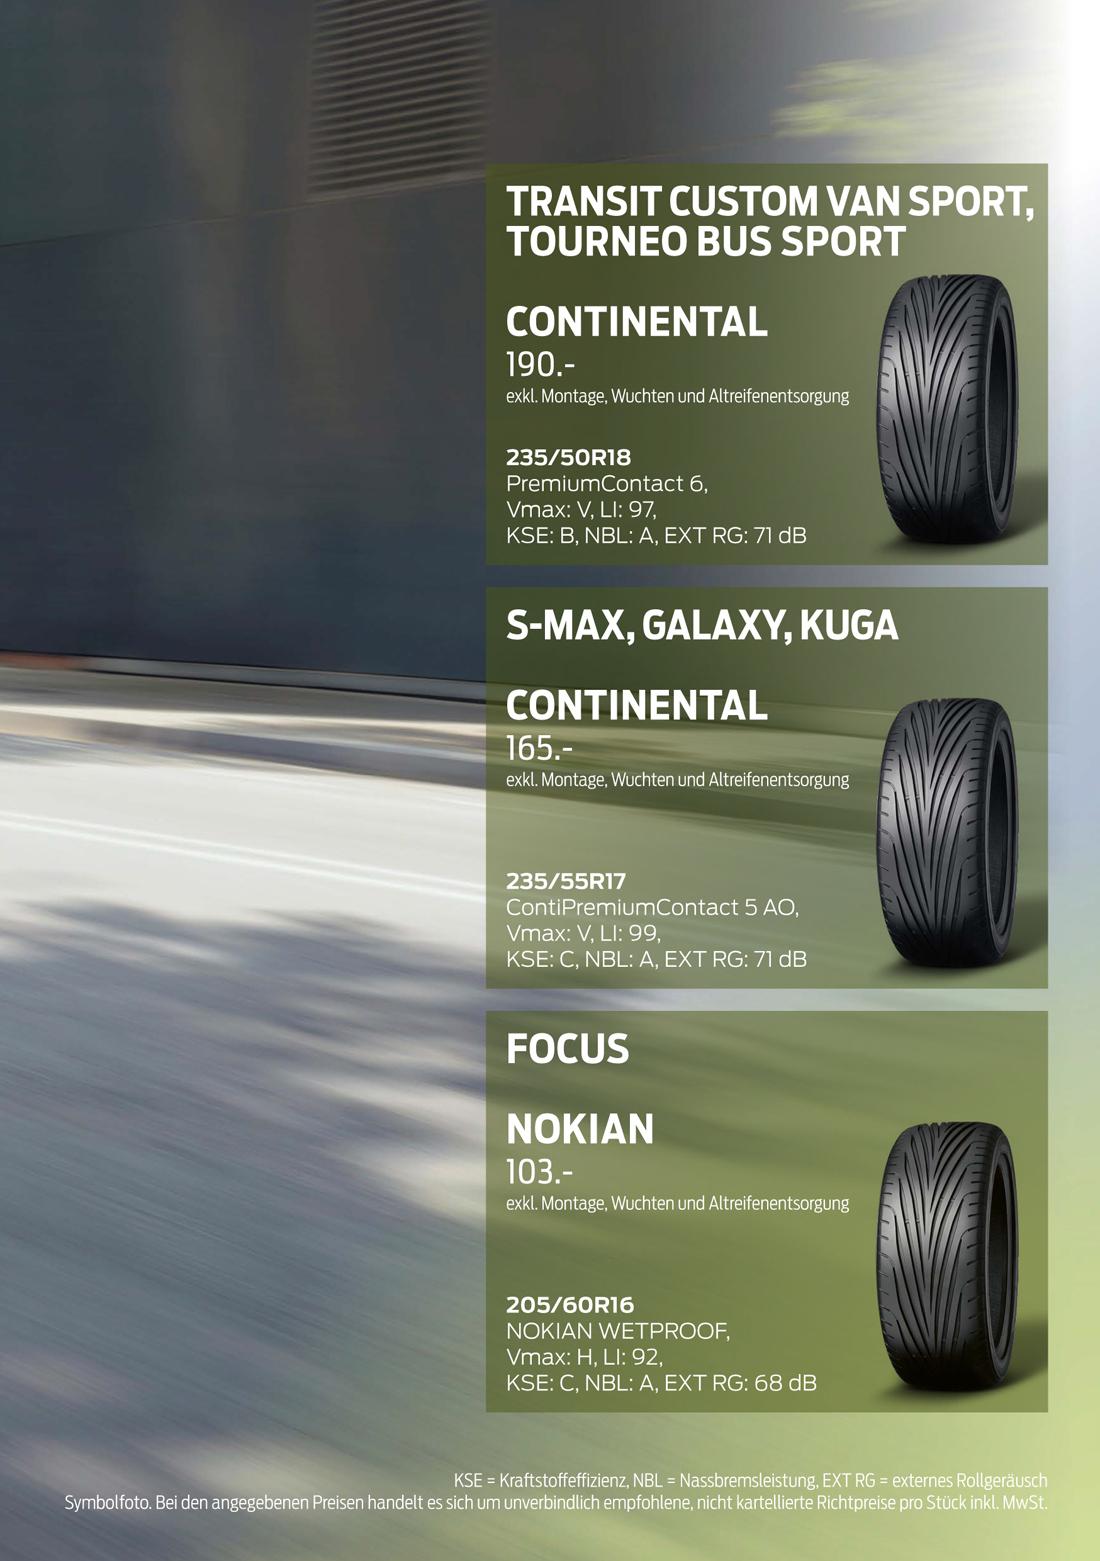 2021-Ford_Fruehlingskampagne_Broschuere-Seite-7a-2021-03-02.jpg#asset:723